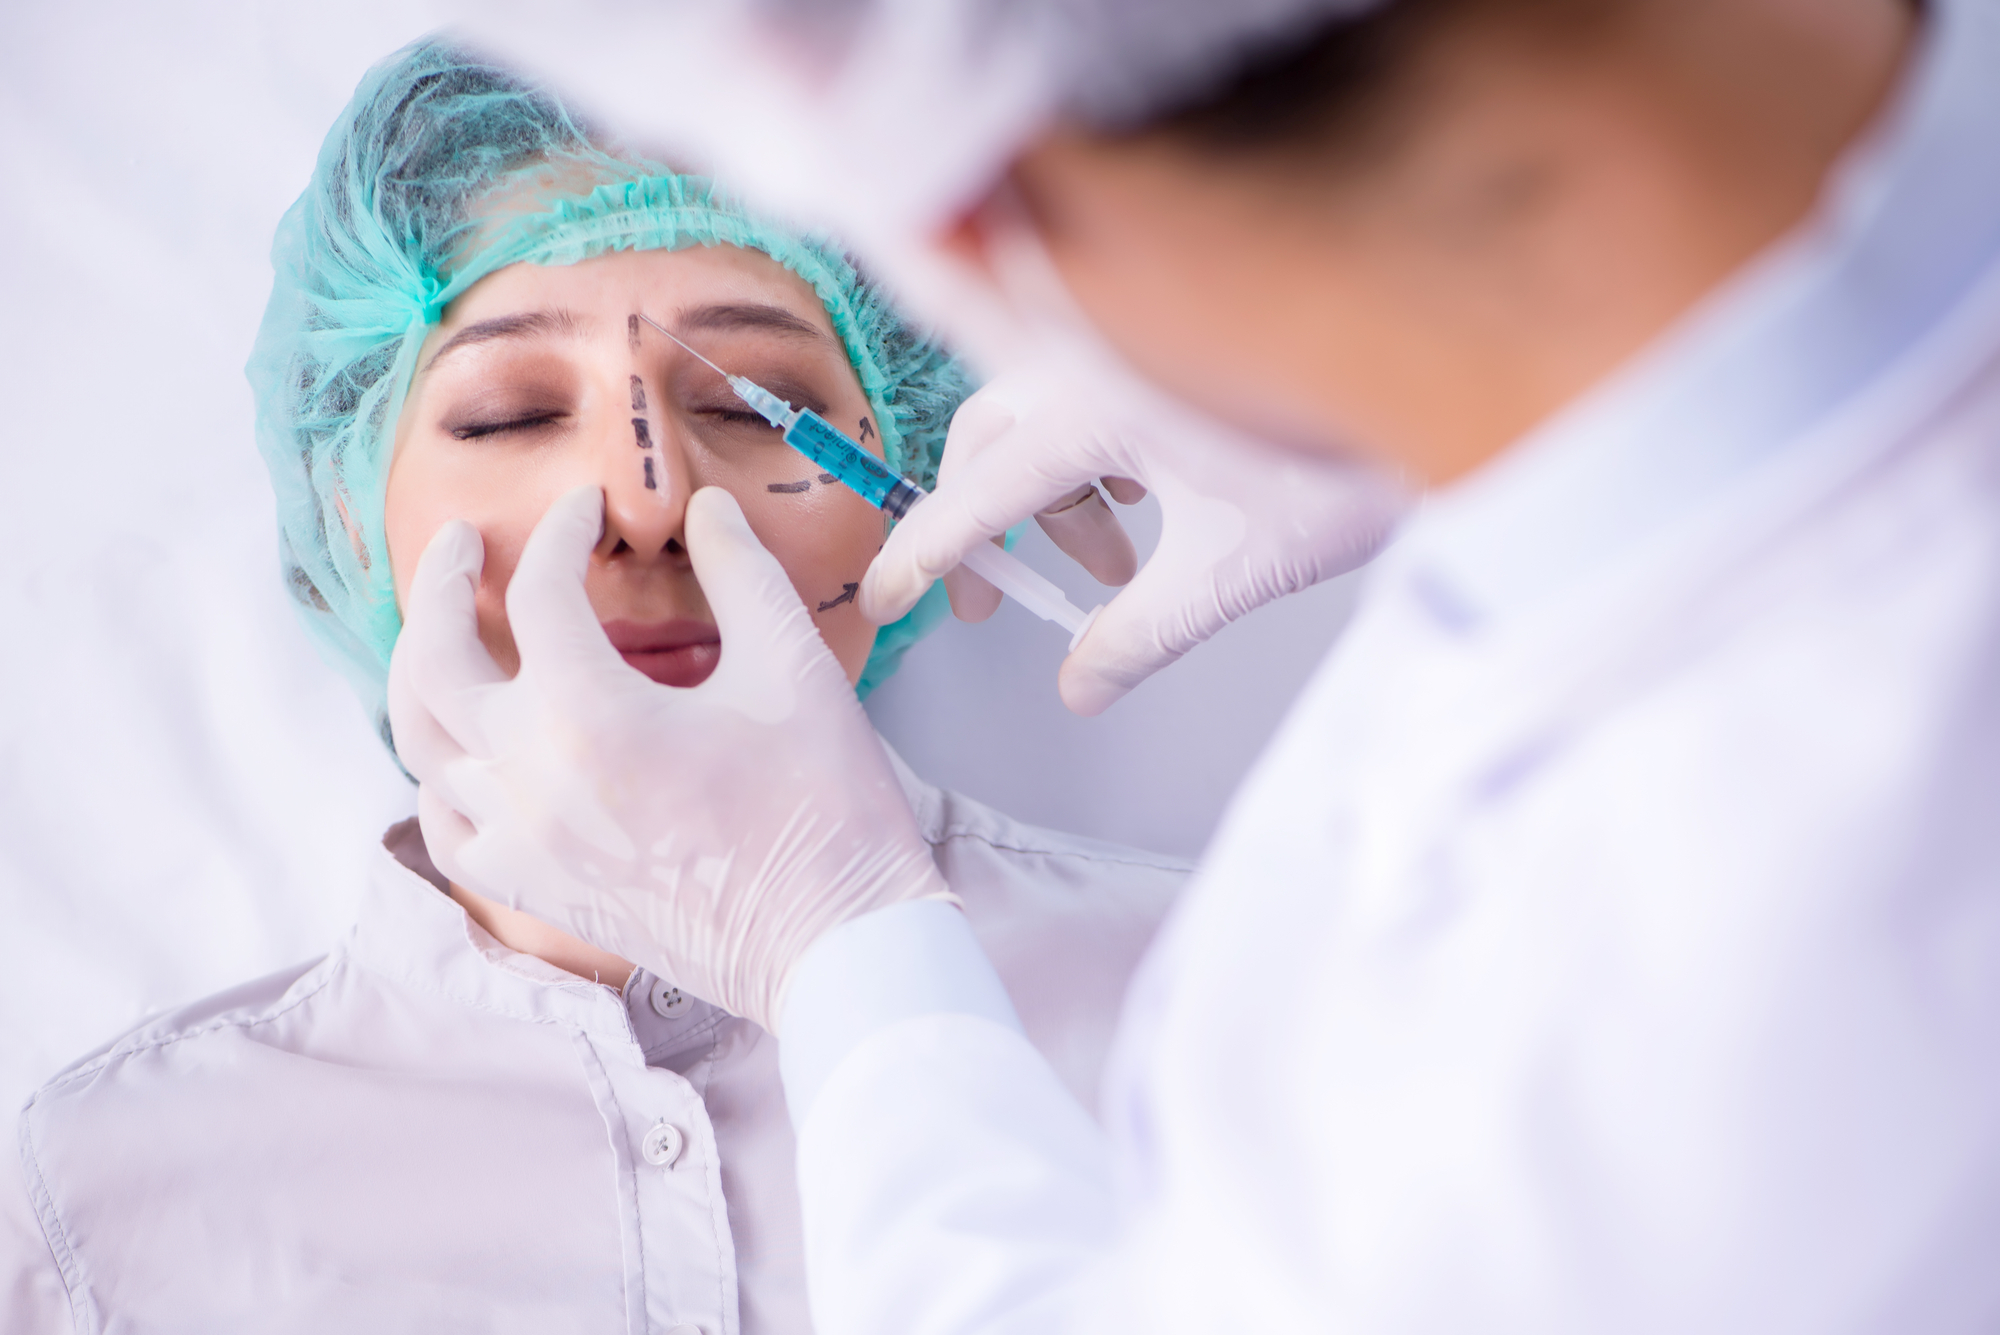 surgeon preparing for rhinoplasty